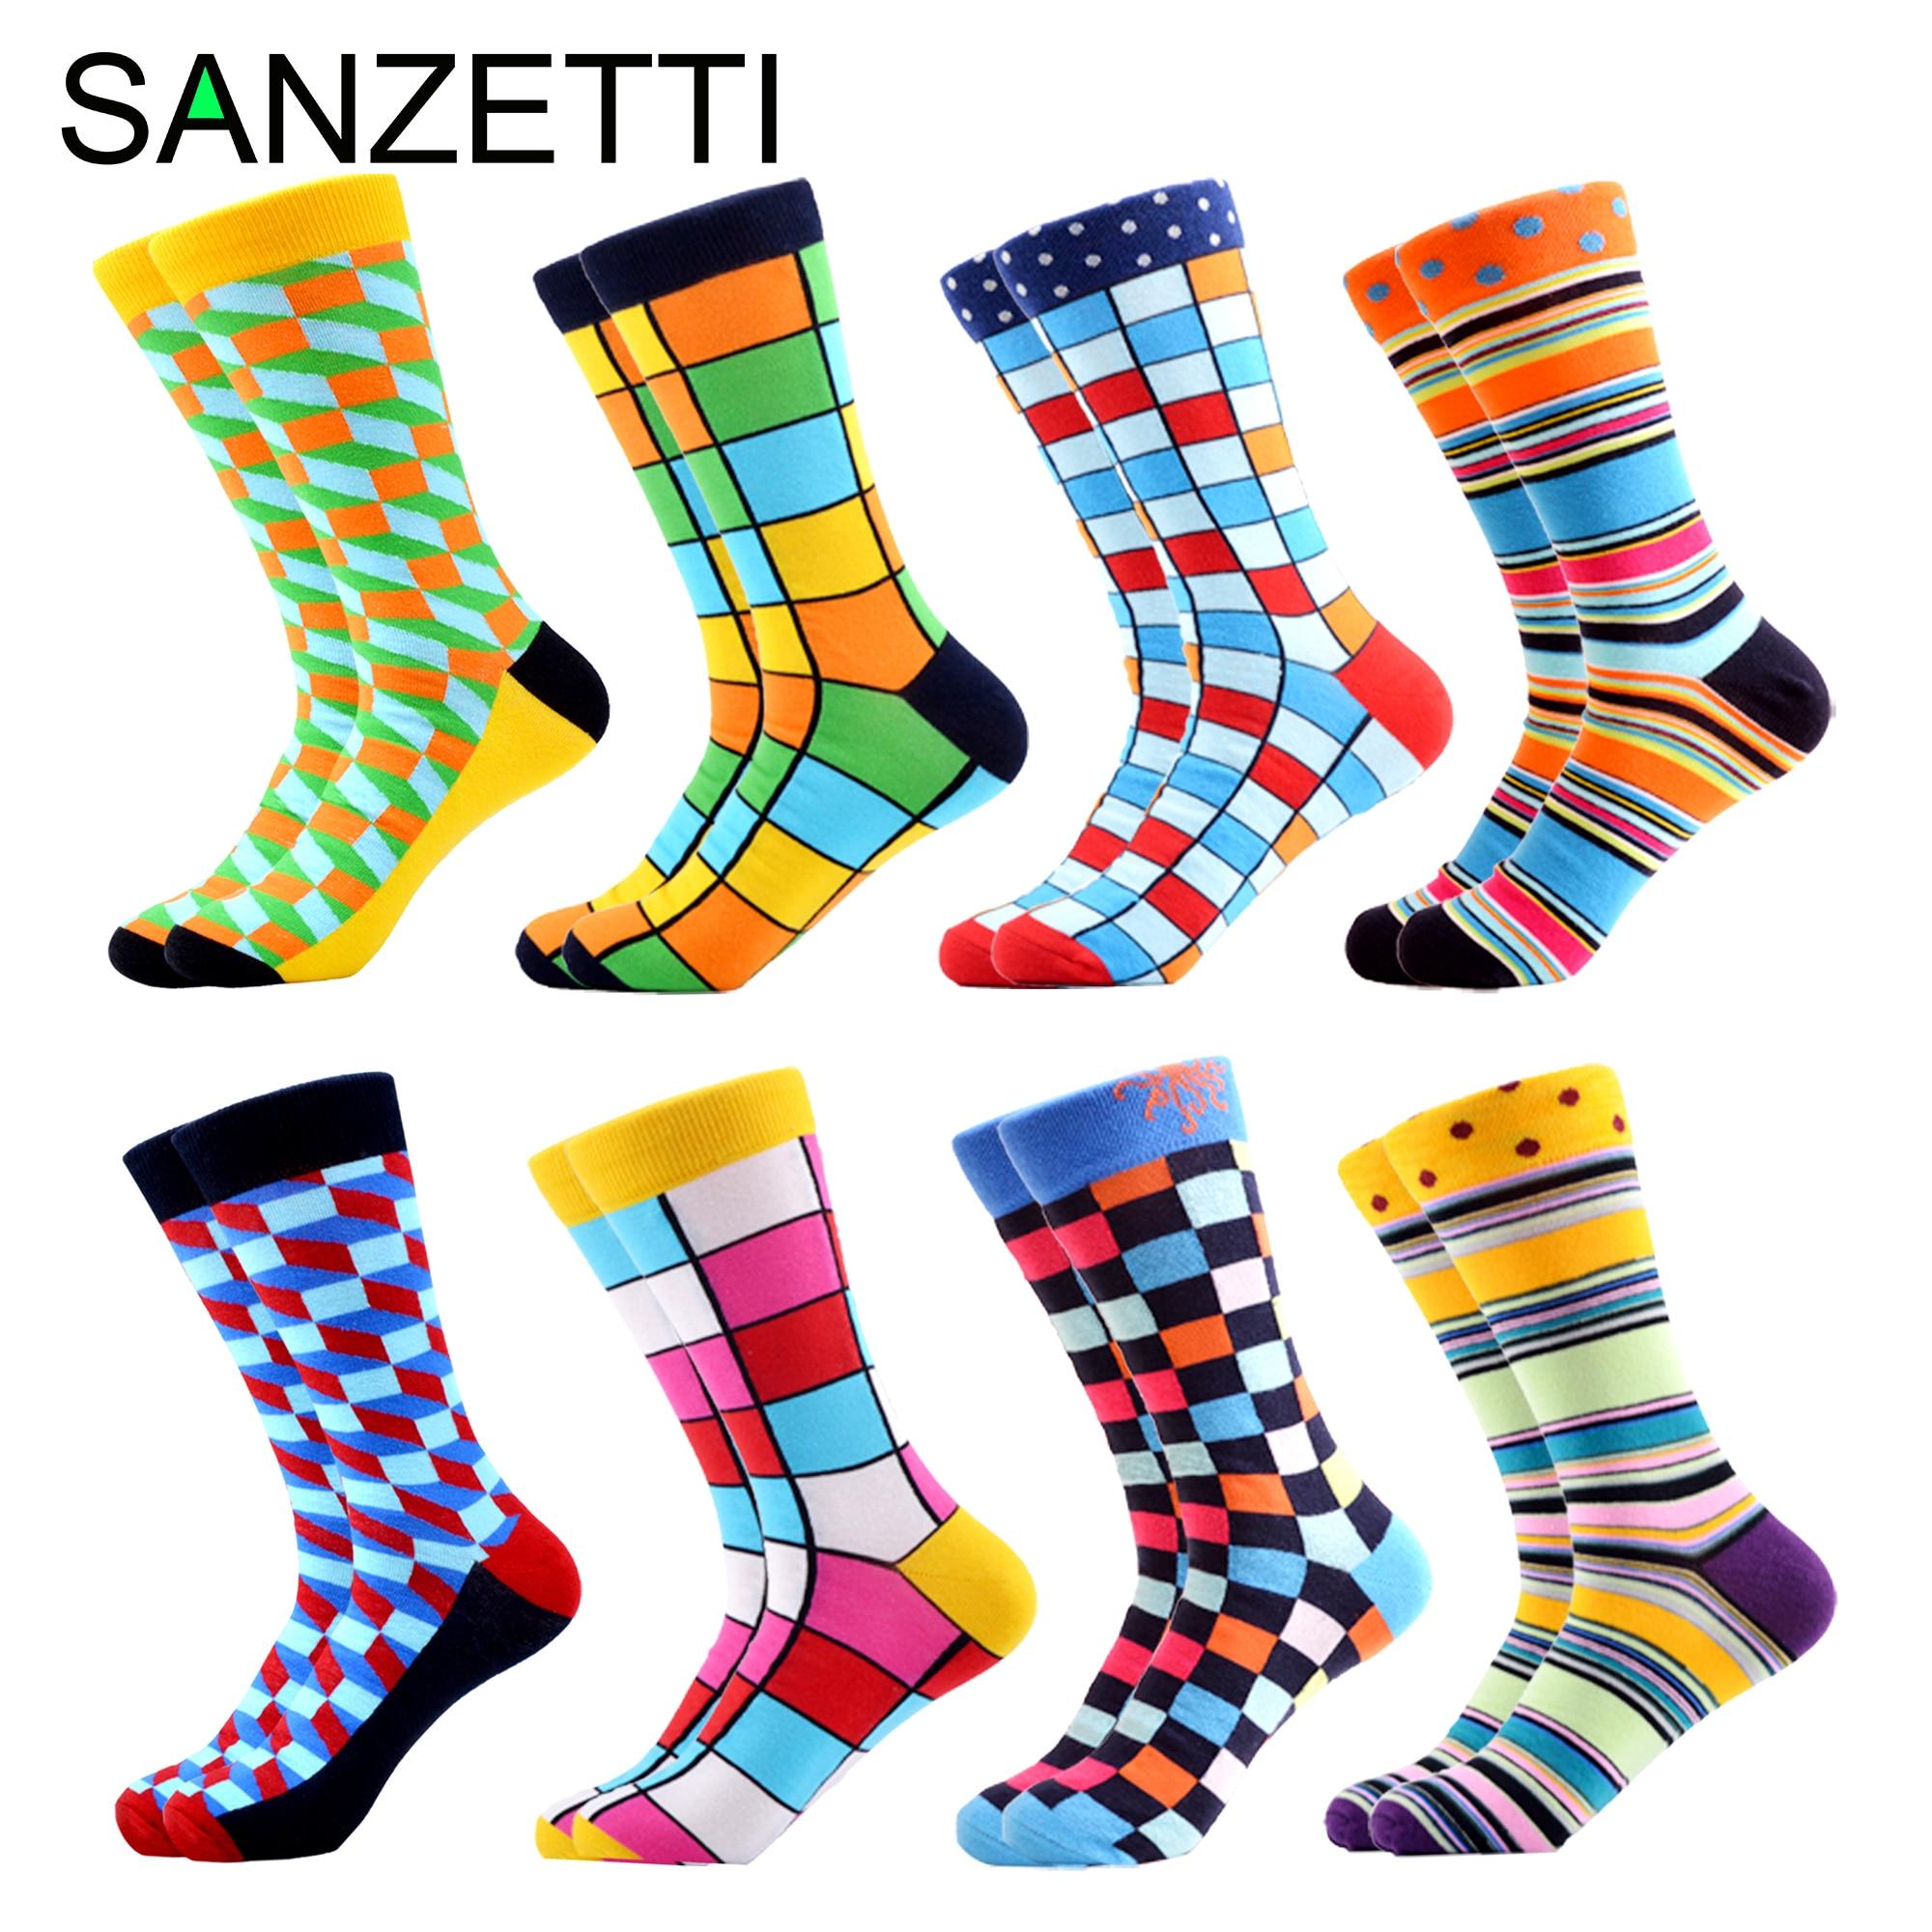 SANZETTI 8 Pairs/Lot Happy Casual Socks Men's Combed Cotton Socks Wedding Pattern Comfortable Fun Party Birthday Gift Pop Socks